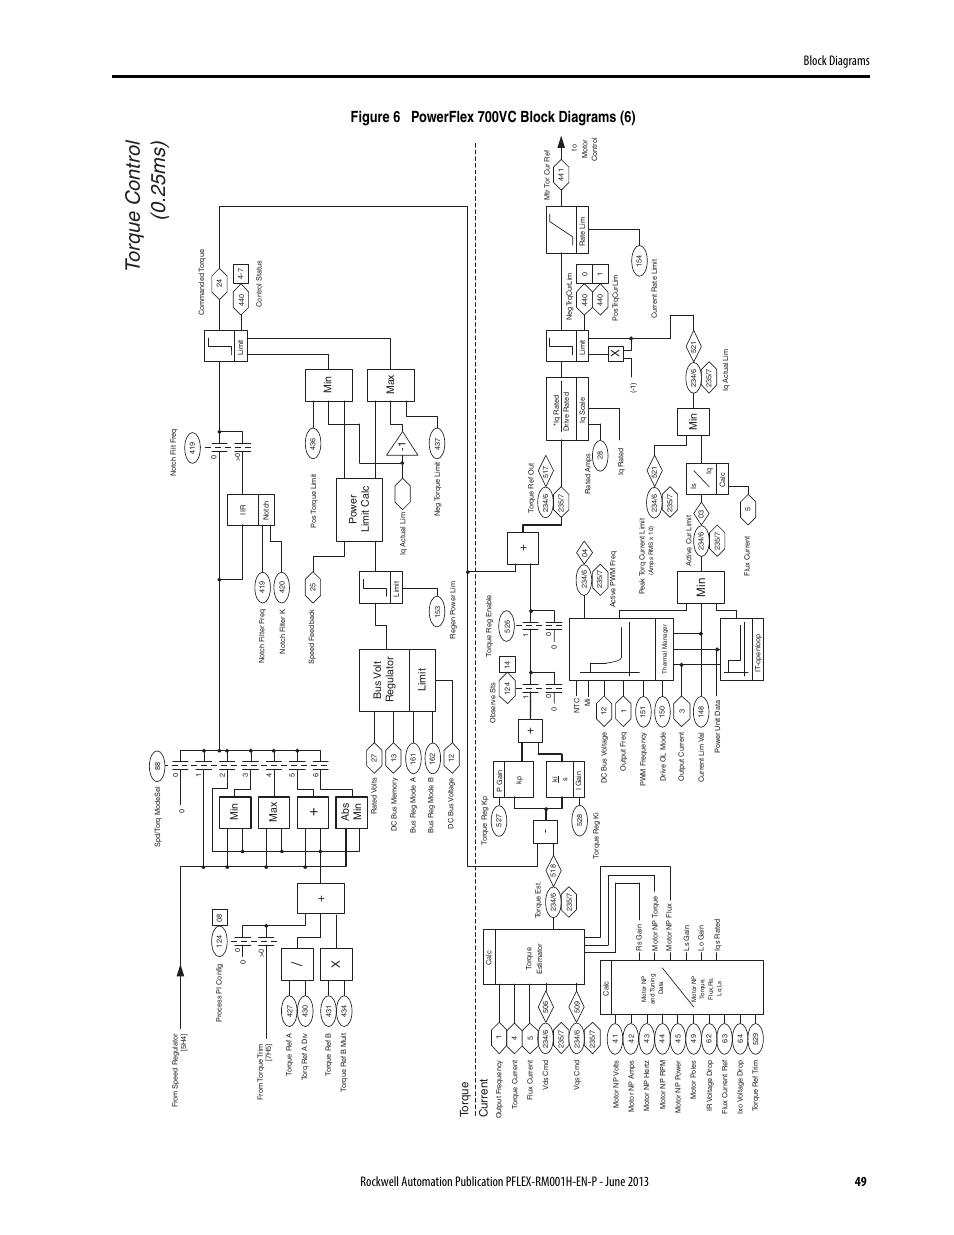 abb dc motor wiring diagram auto electrical wiring diagram 4 Wire Electric Motor Wiring Diagram electrical drives ac vfd dc diagram auto wiring diagram